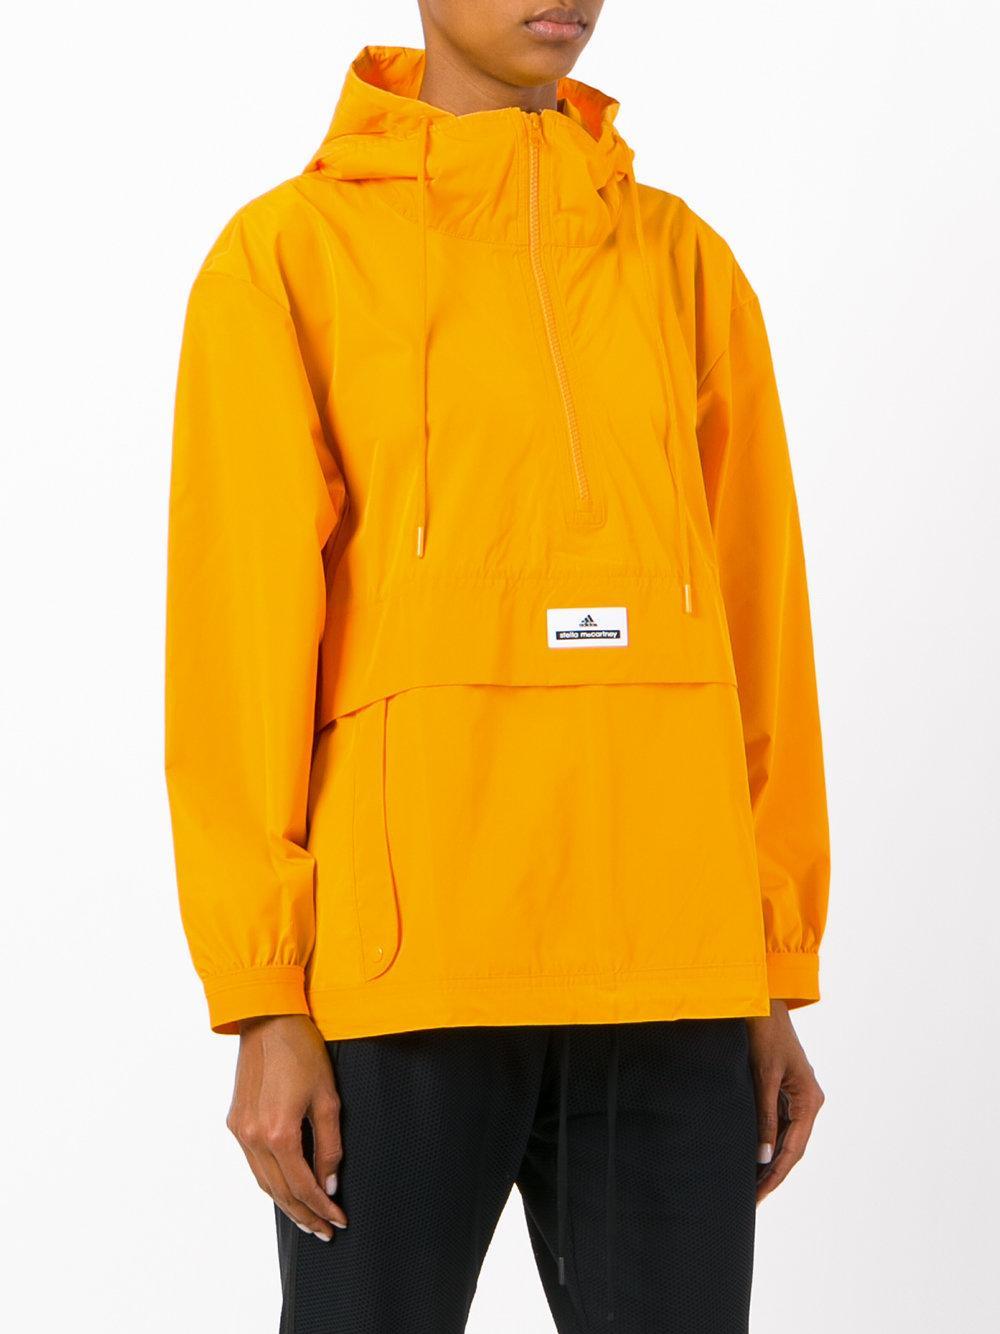 Adidas By Stella Mccartney Hooded Shell Jacket Women